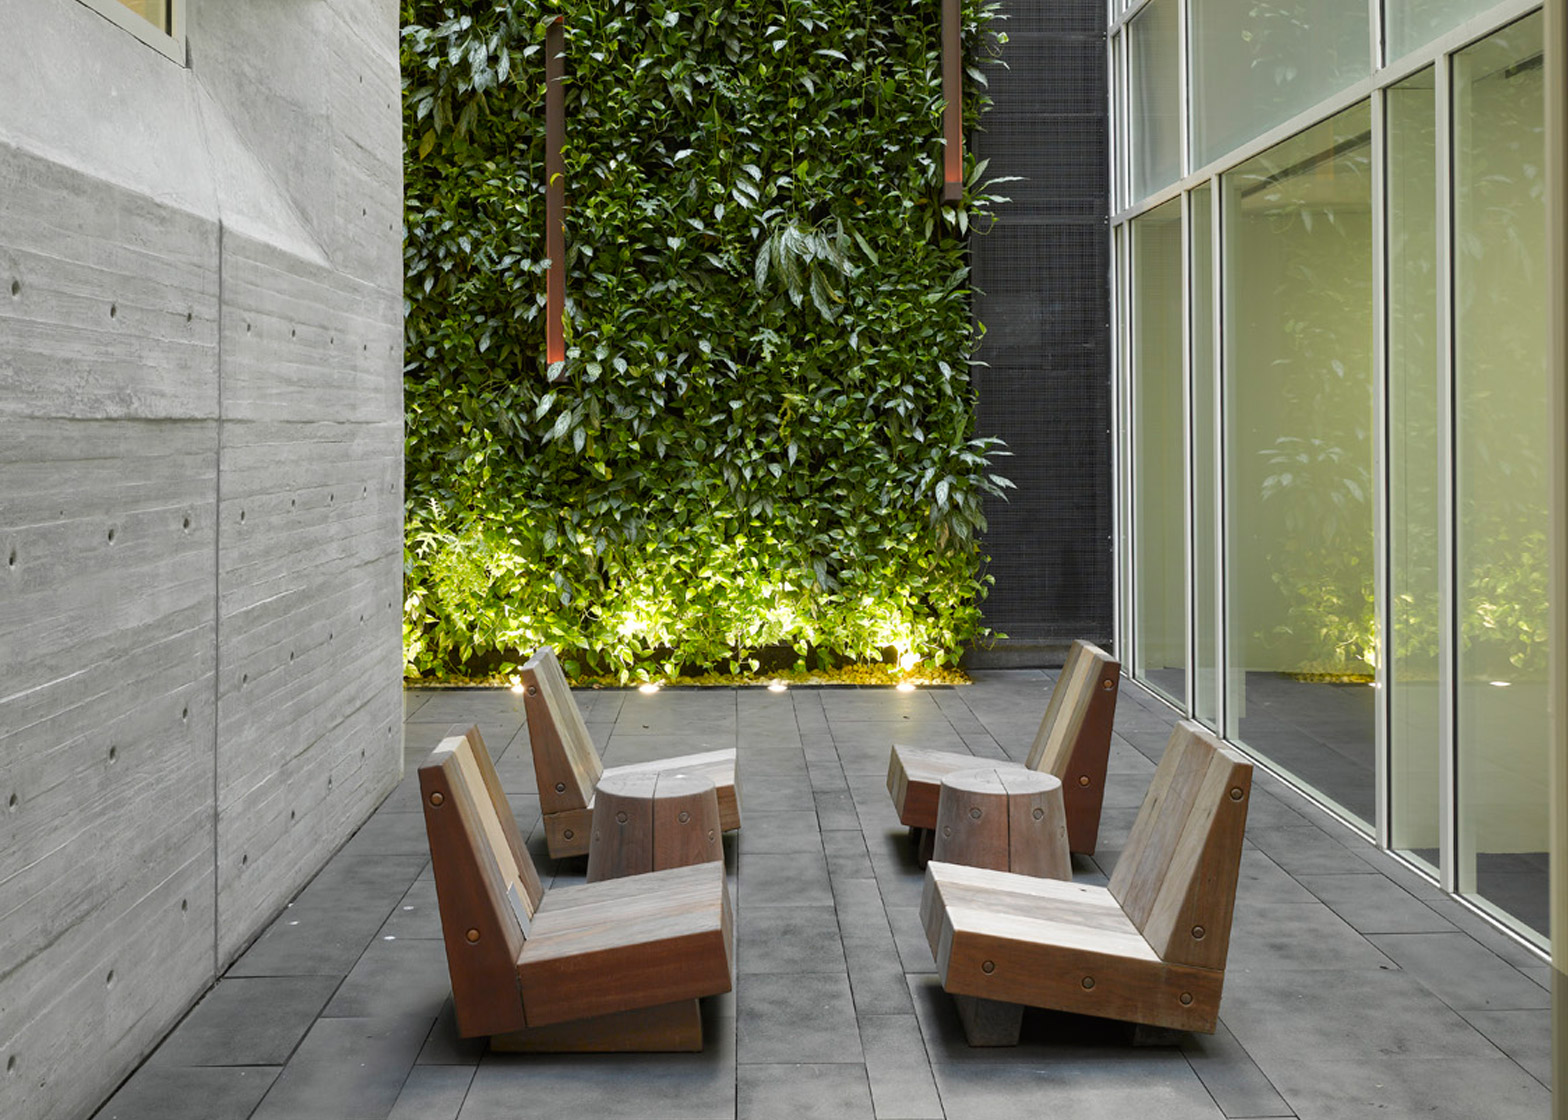 Leblon Offices by Richard Meier and Partners